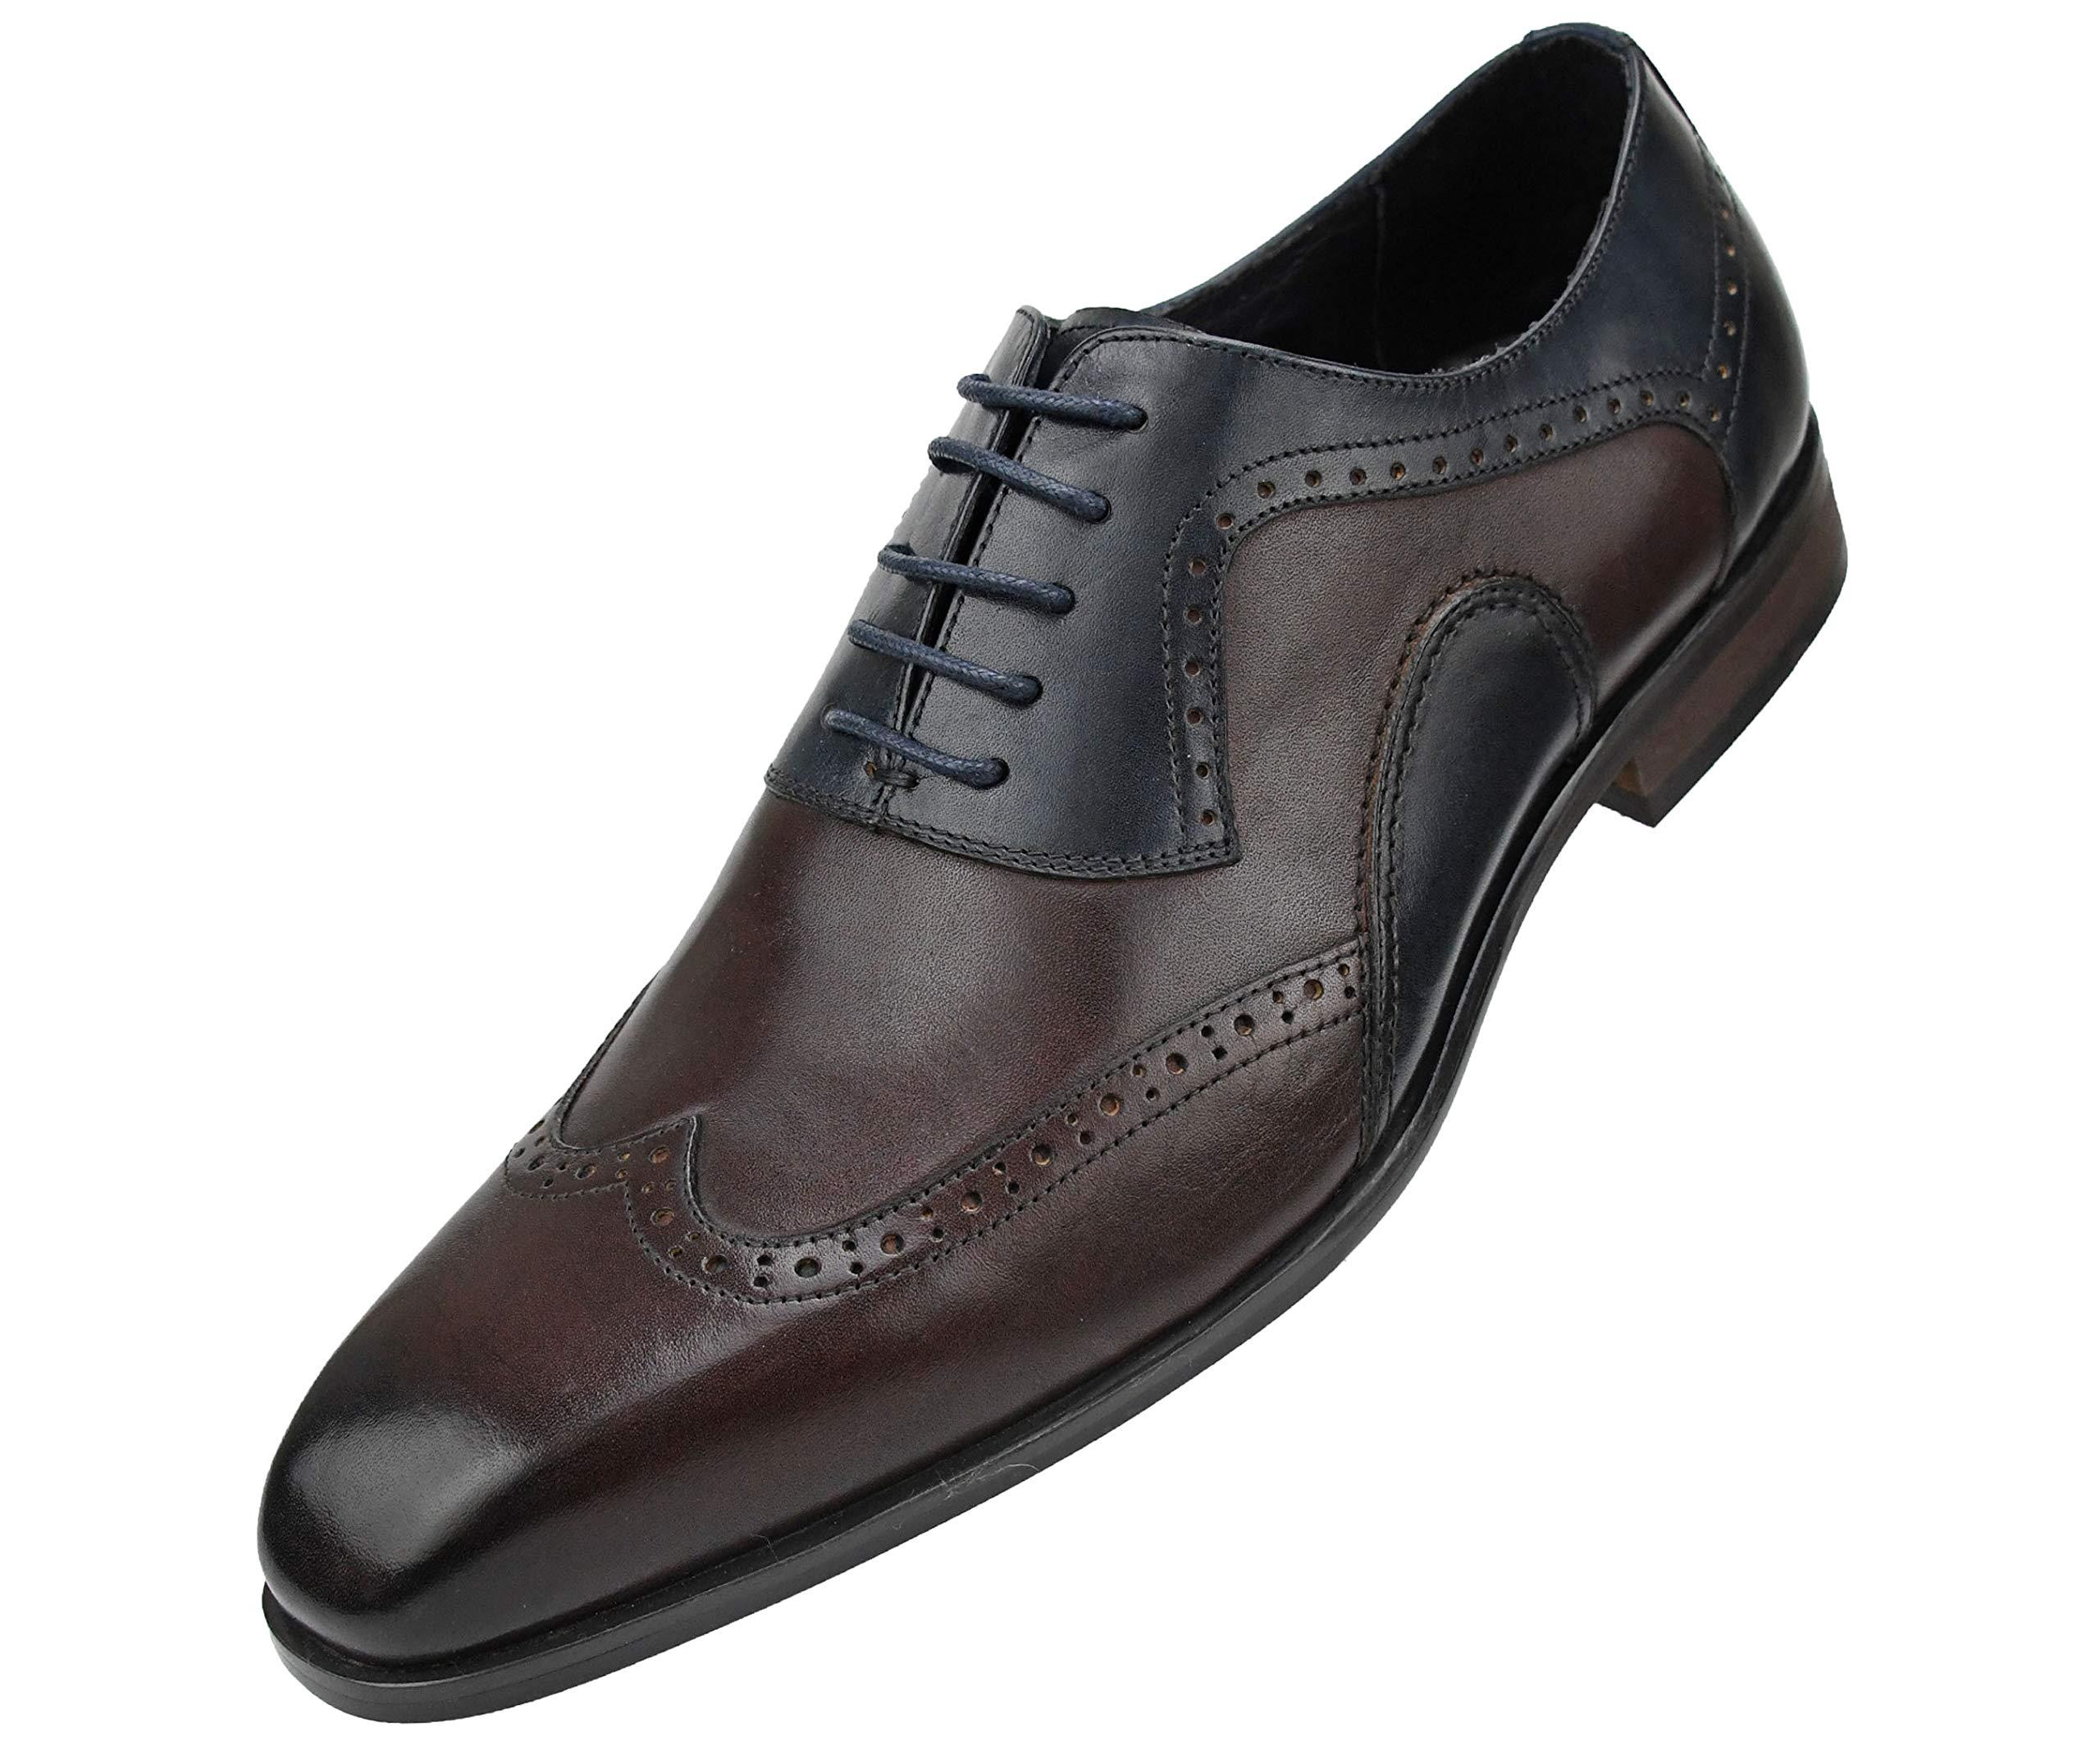 Asher Green Mens Genuine Leather Burnished Oxford Wingtip Dress Shoe, Lace-up Single Monkstrap